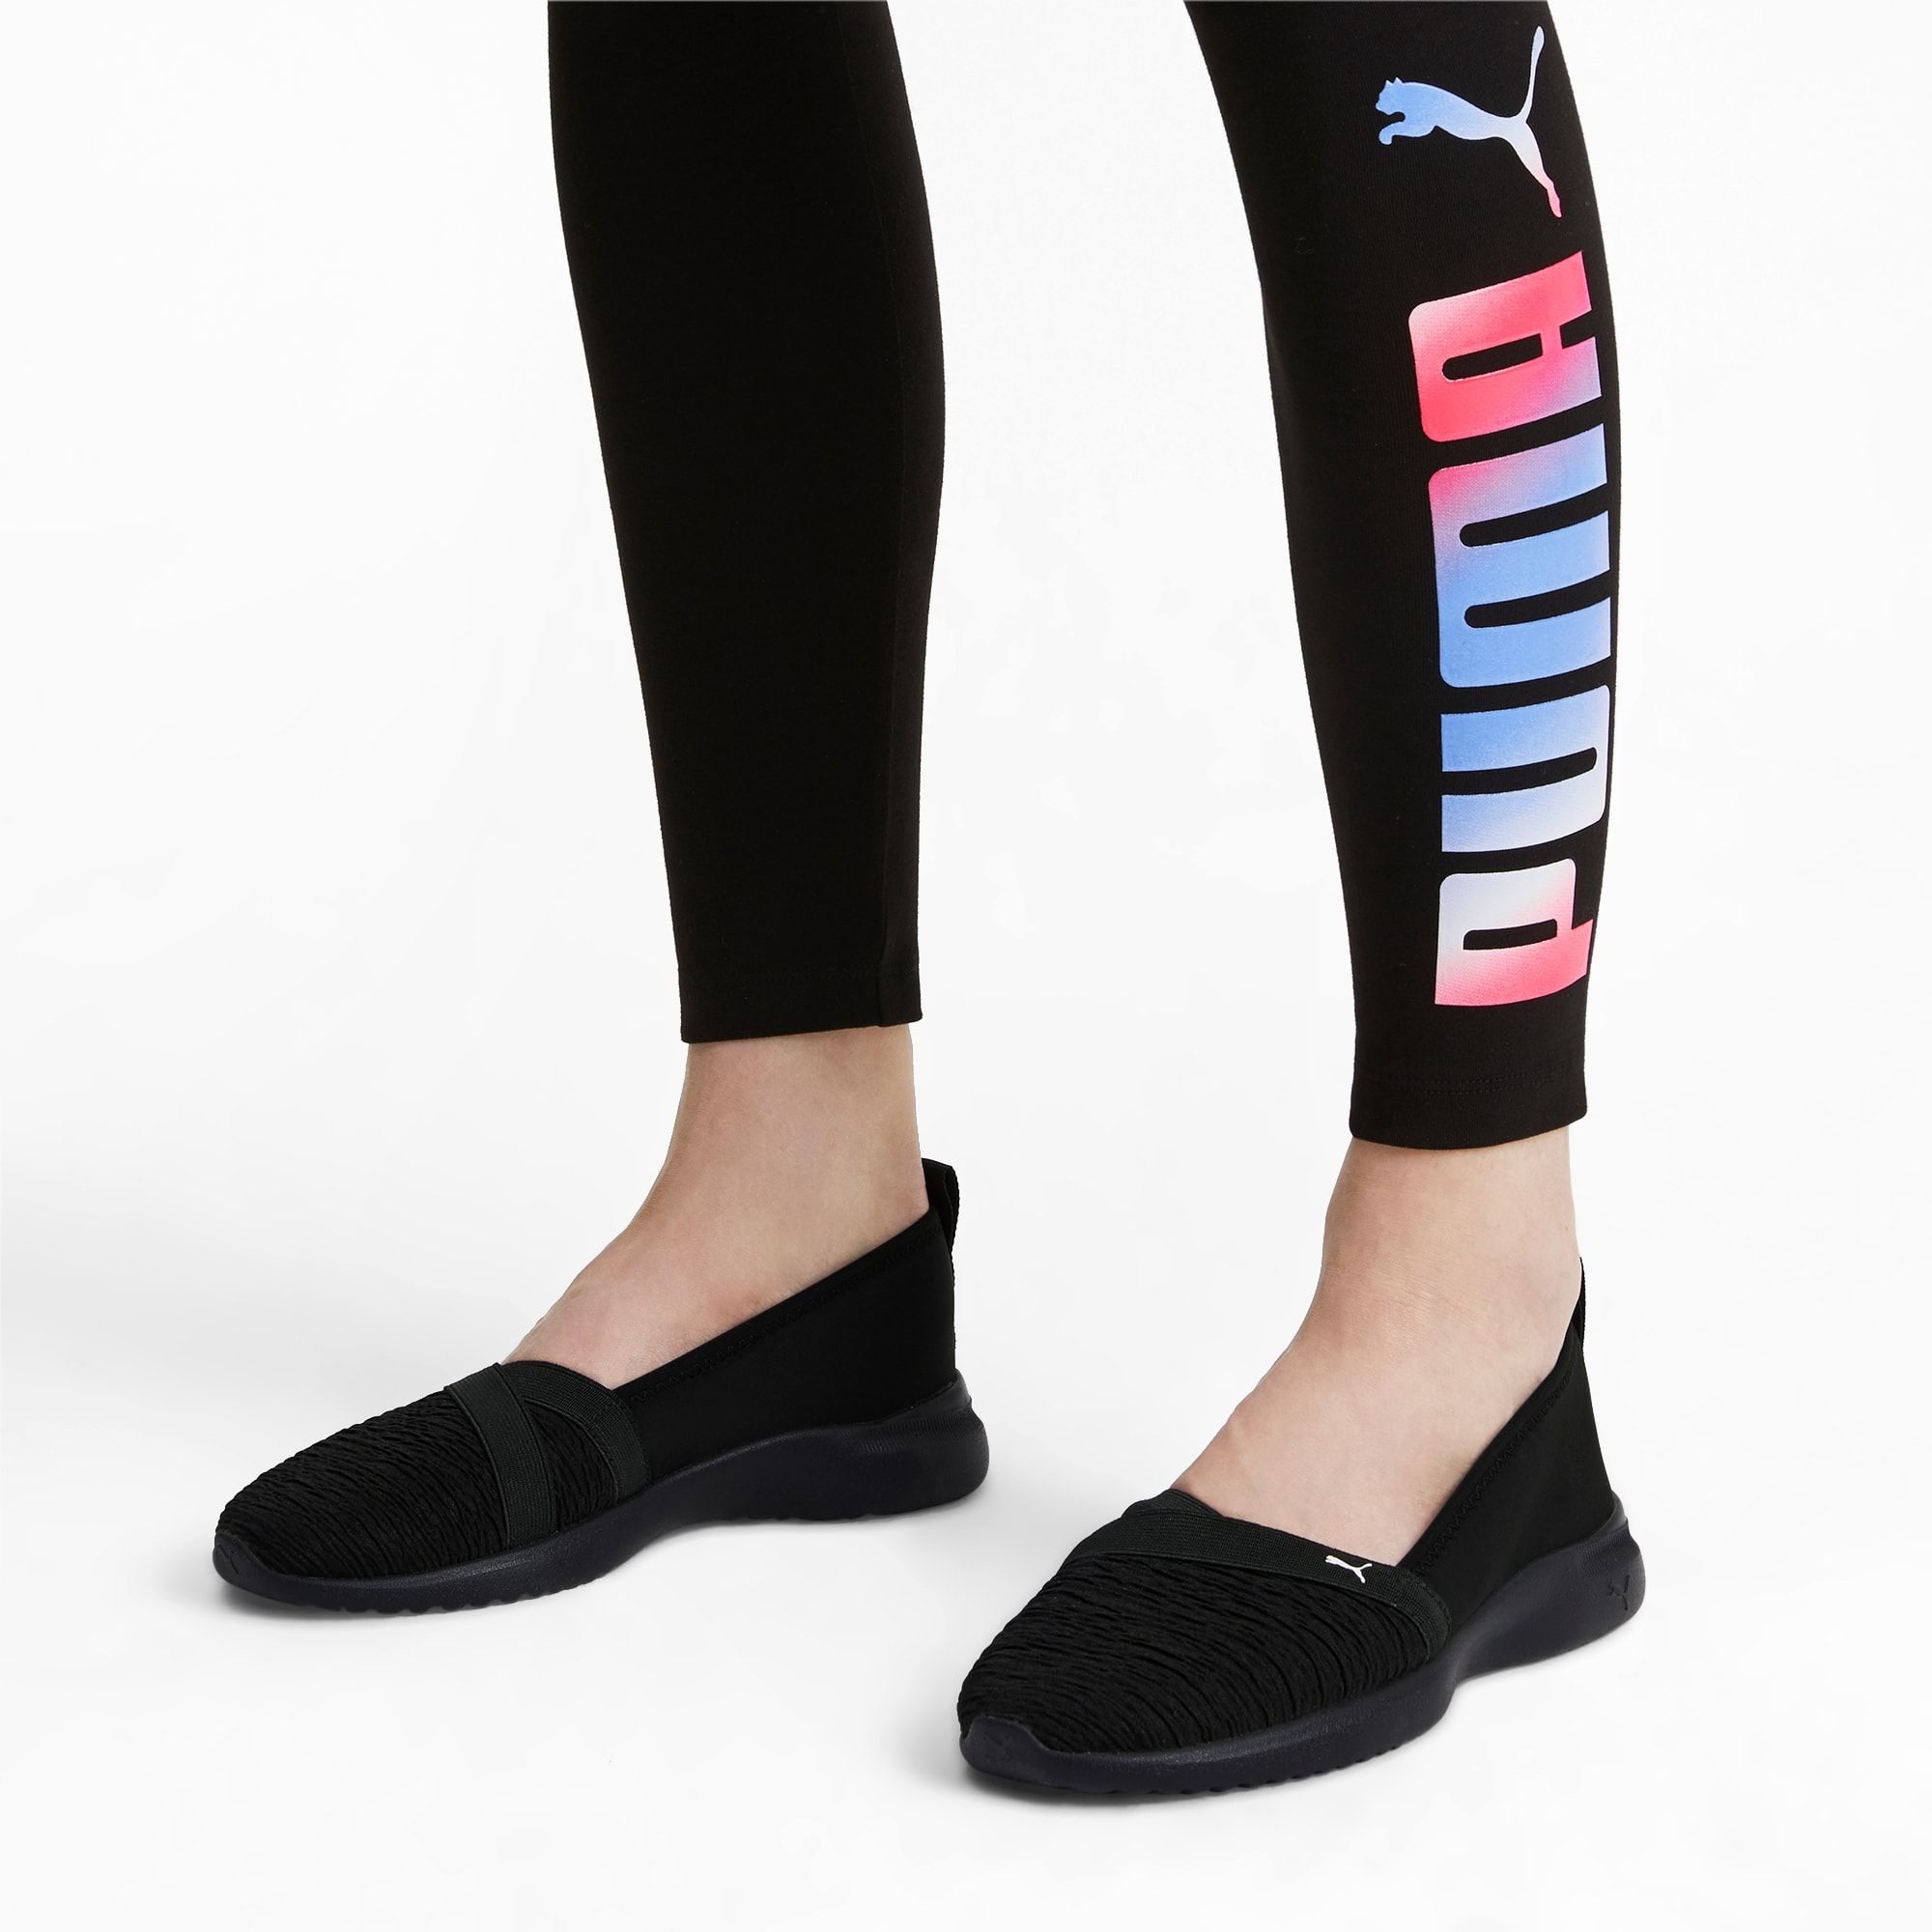 PUMA Adelina Slip-On Basketball Shoes for Women, Black / White ...